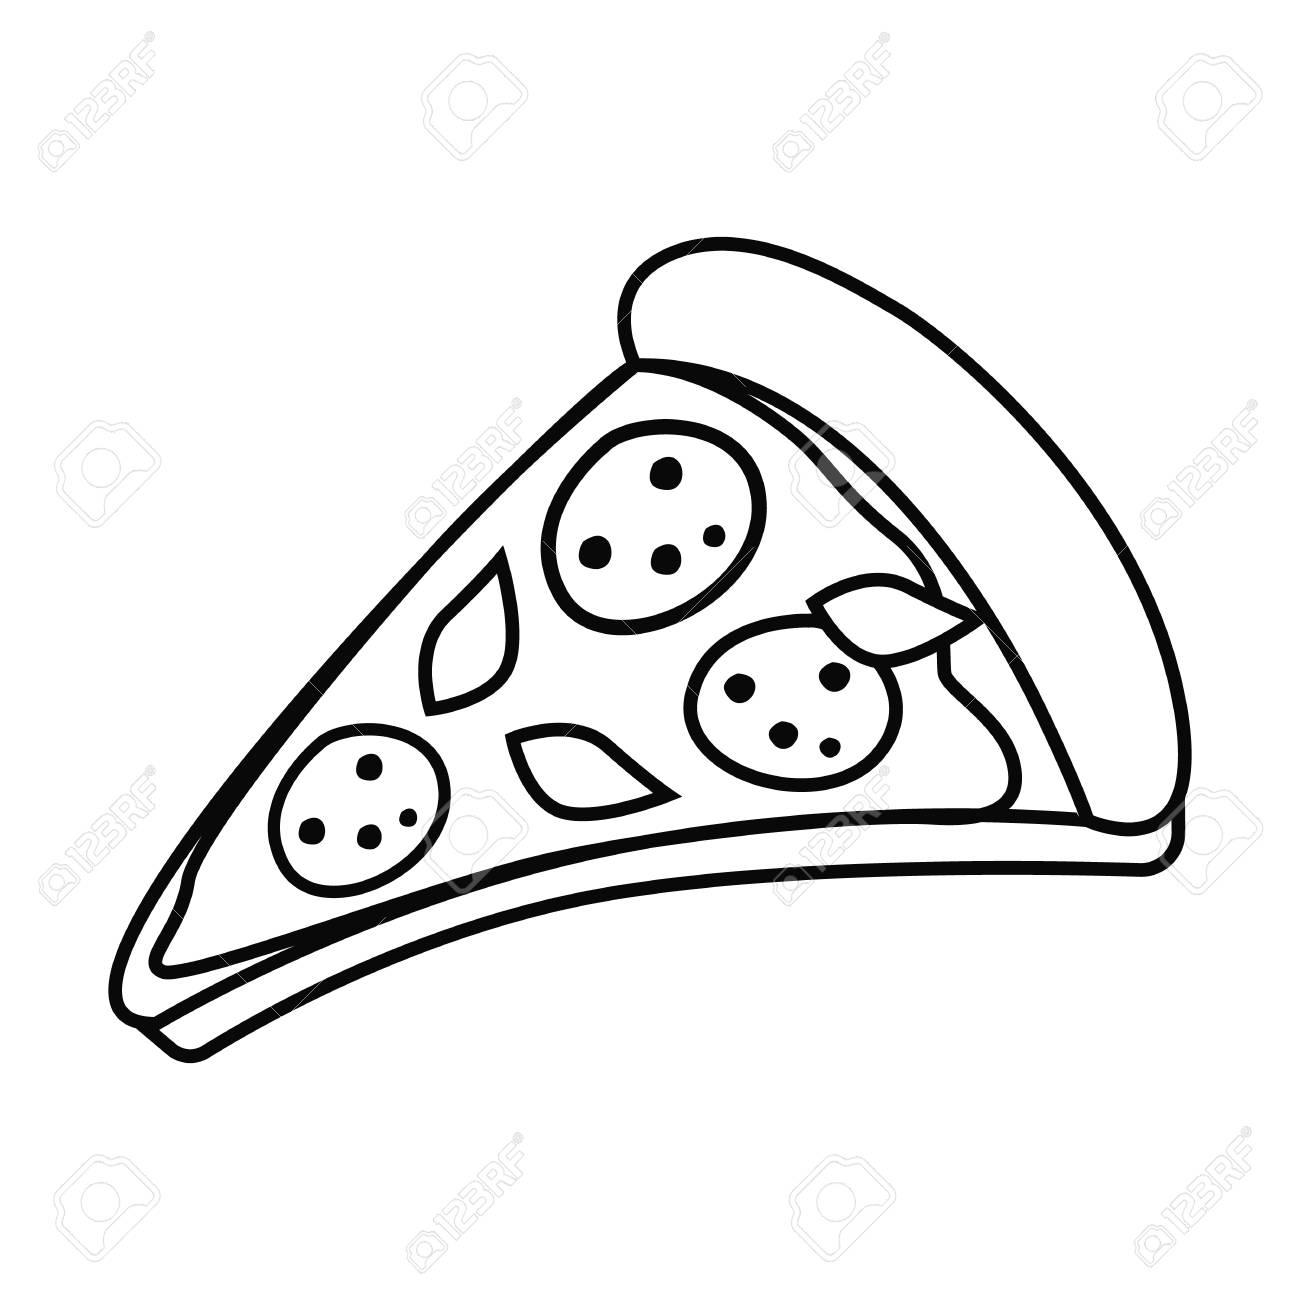 Pizza slice in outline, black and white illustration..